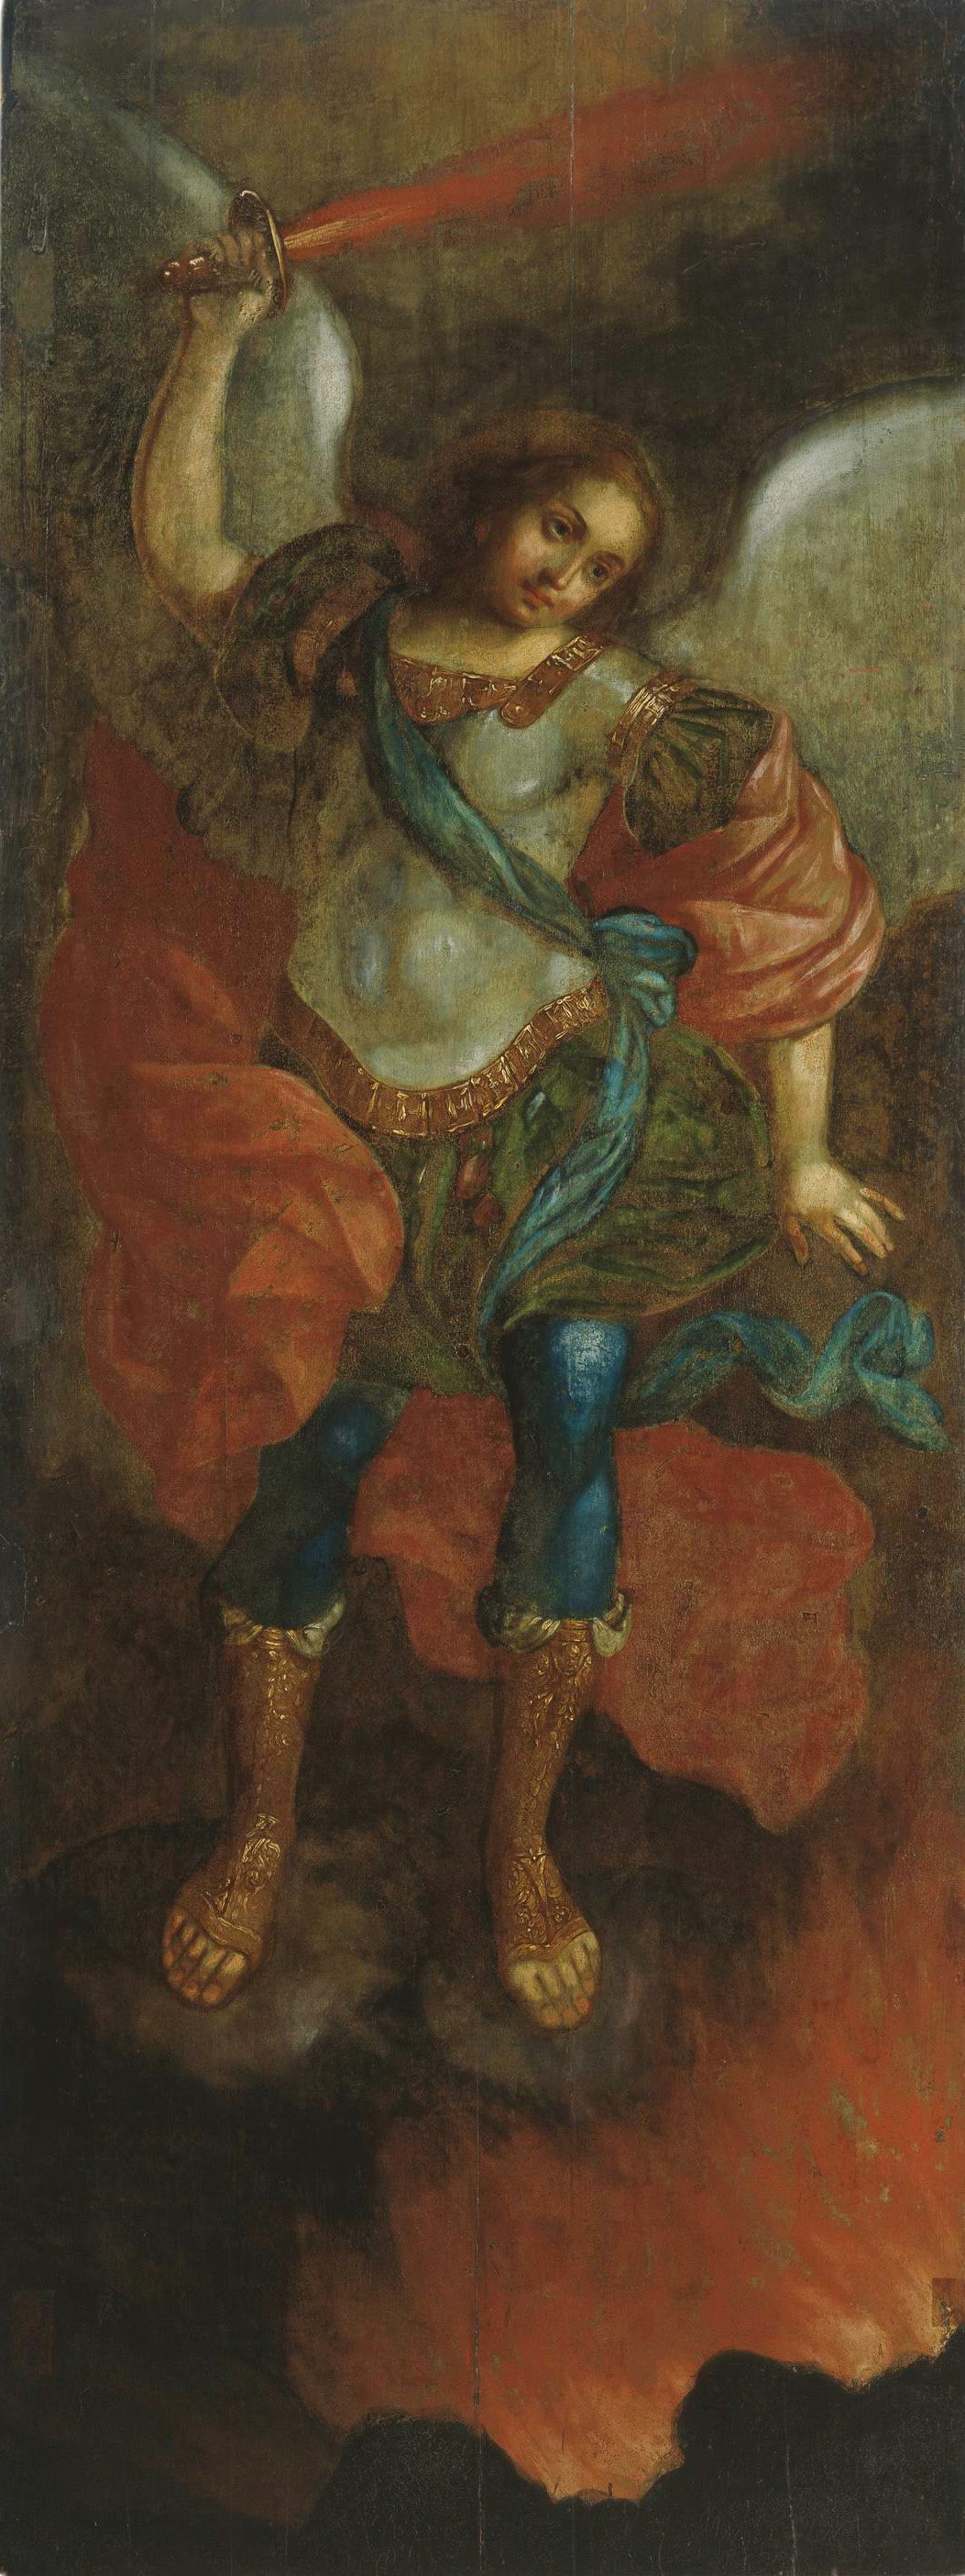 Vladimir Borovikovsky. Archangel Michael with a sword